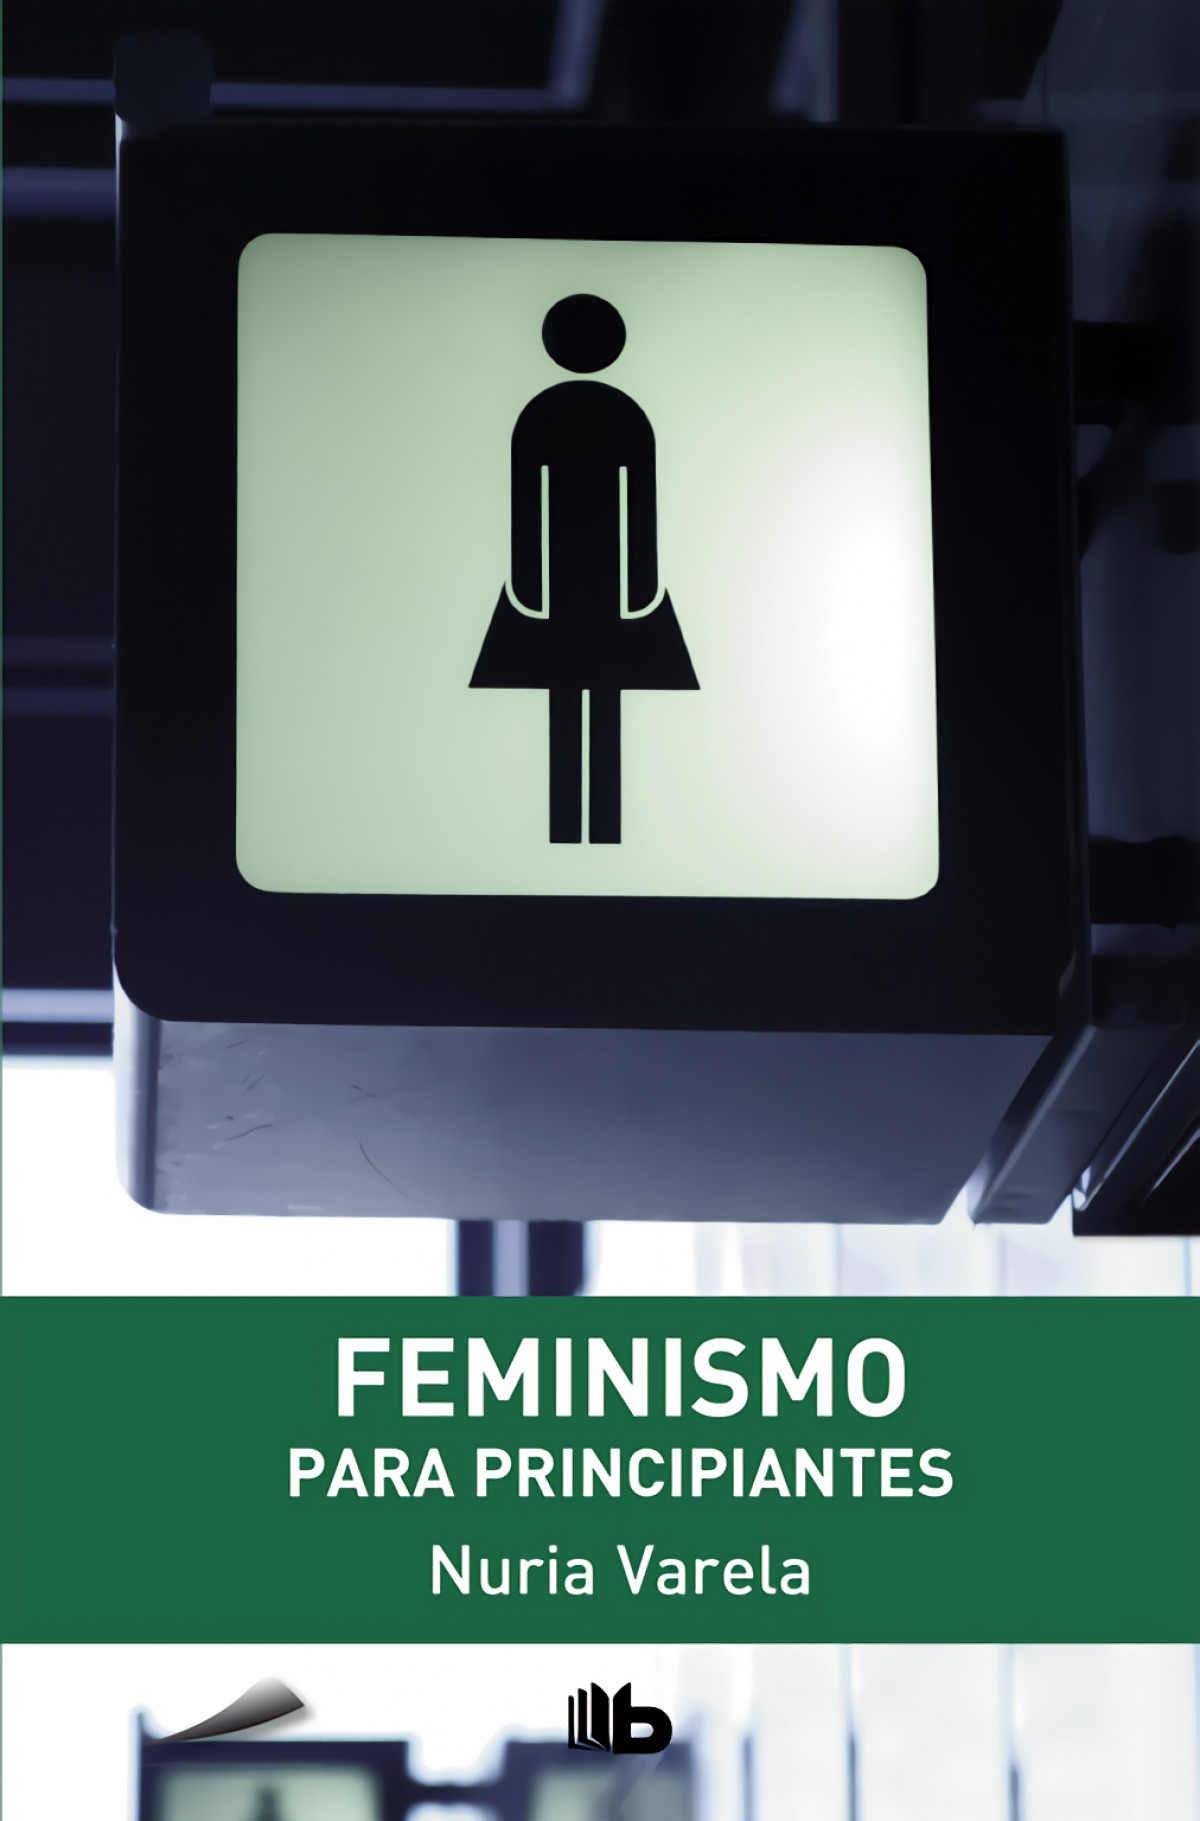 Feminismo para principiantes 9788498728736